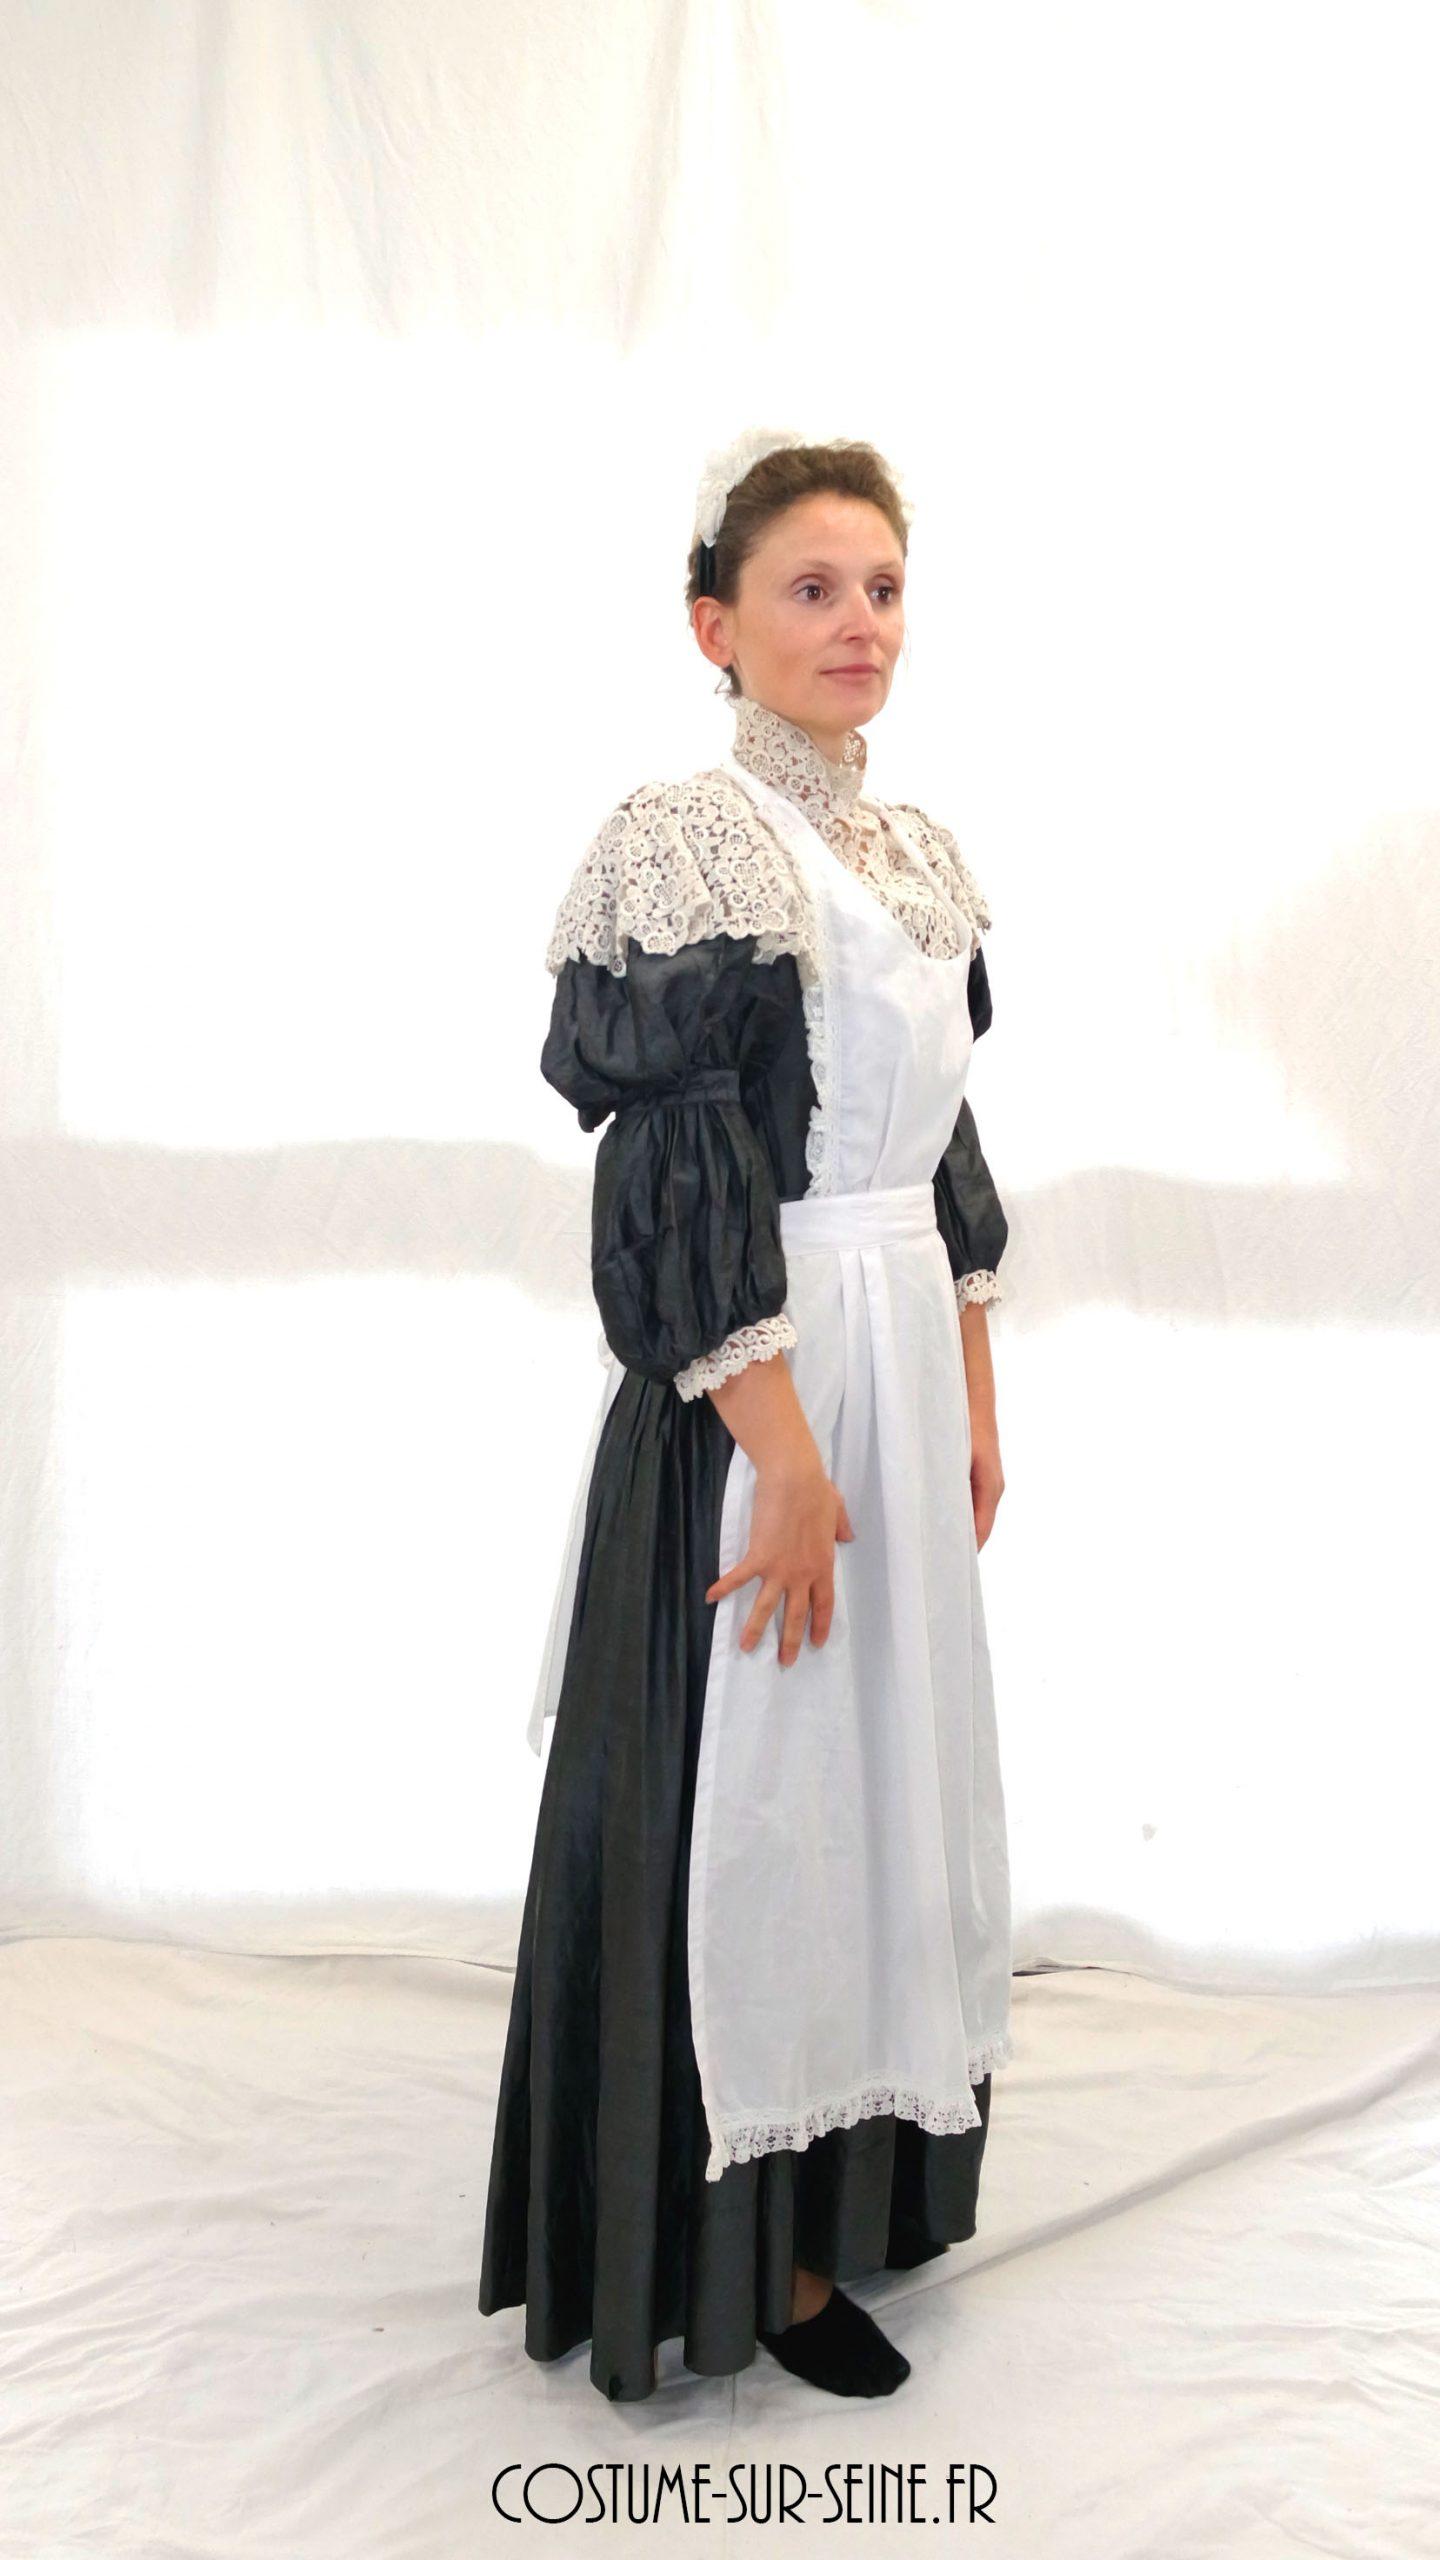 costume soubrette FeydeauURES